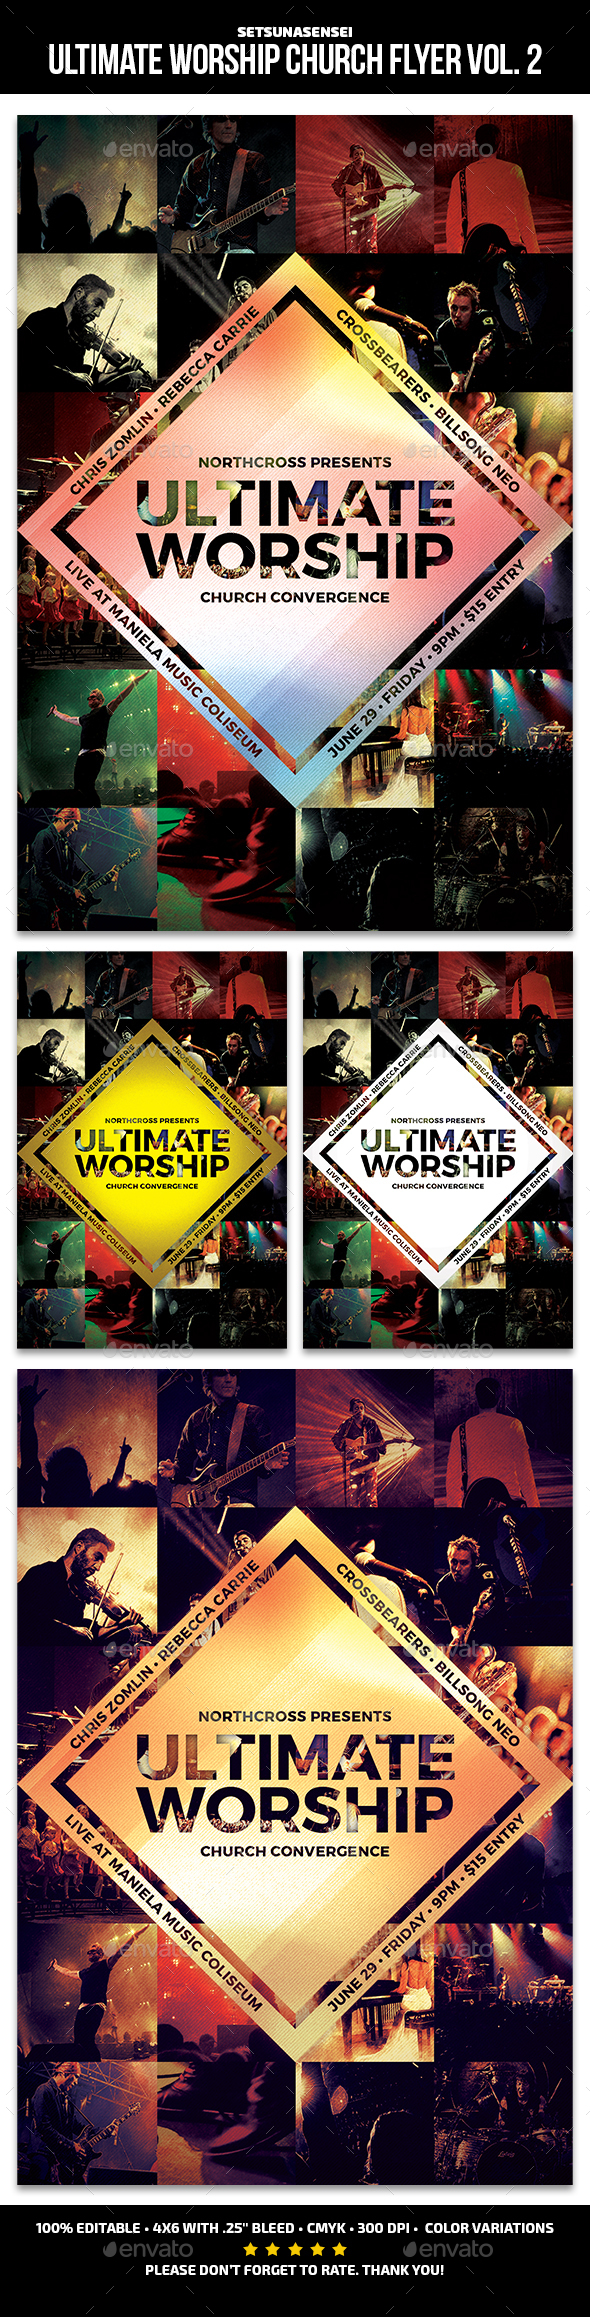 Ultimate Worship Church Flyer Vol. 2 - Church Flyers